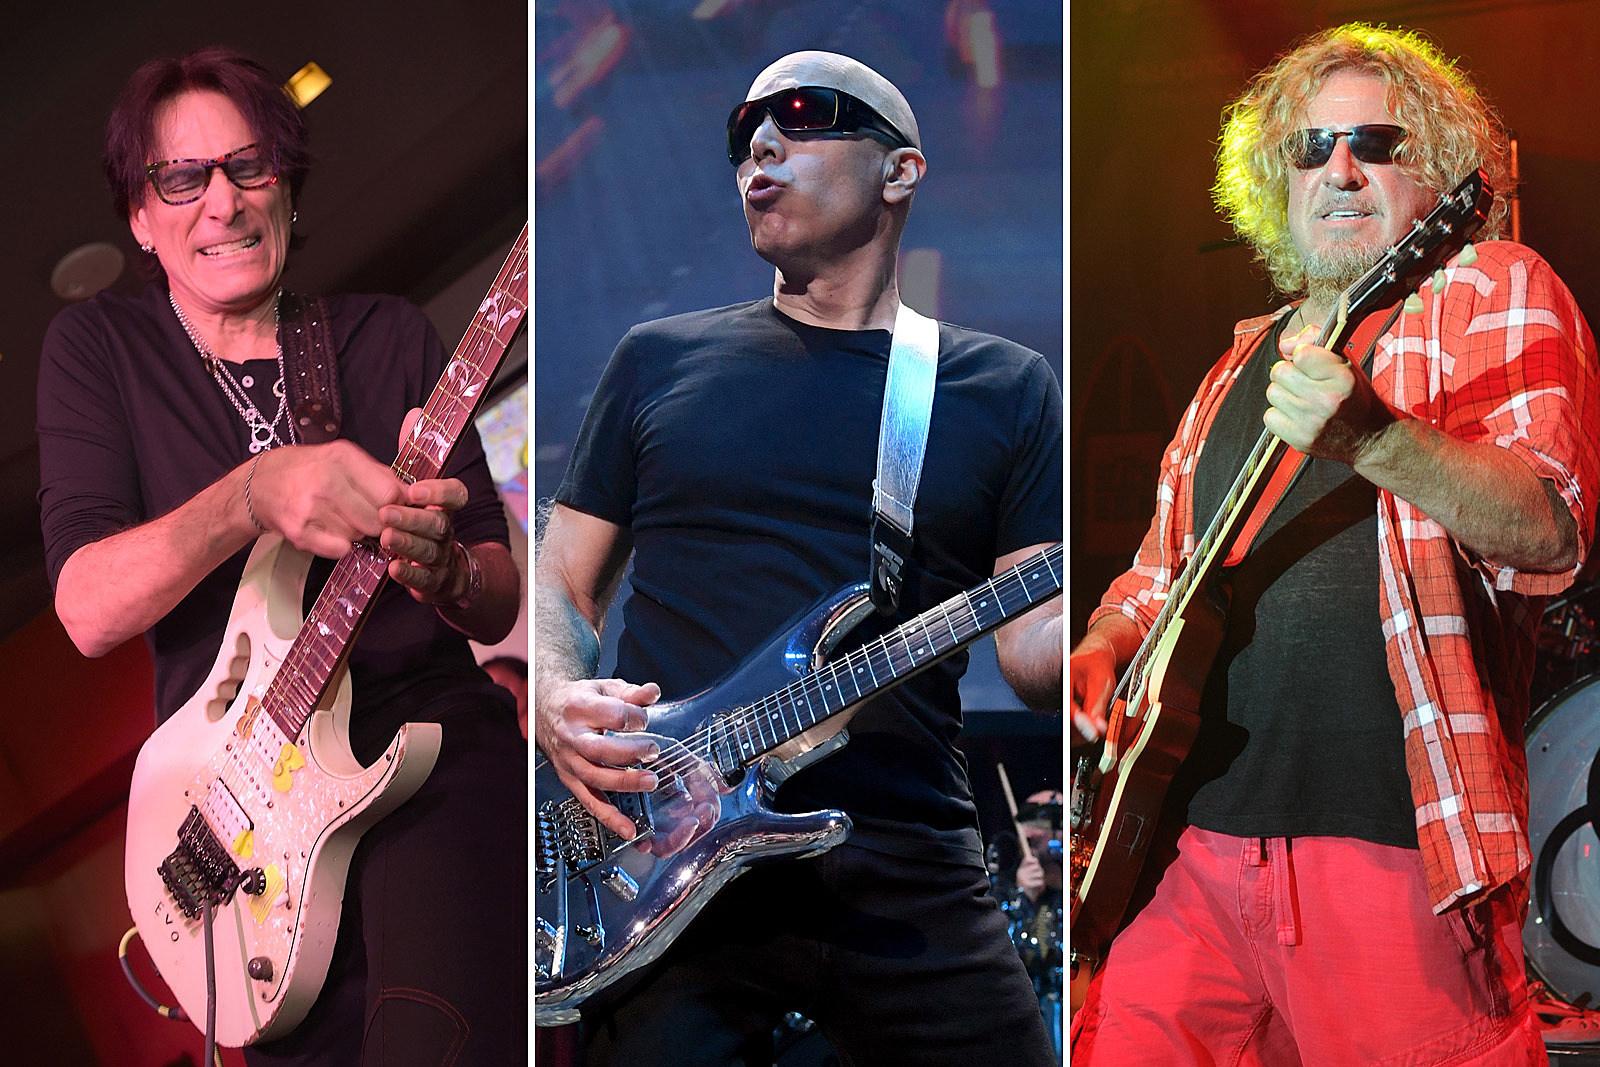 Watch Steve Vai, Sammy Hagar Jam to Joe Satriani Backing Tracks